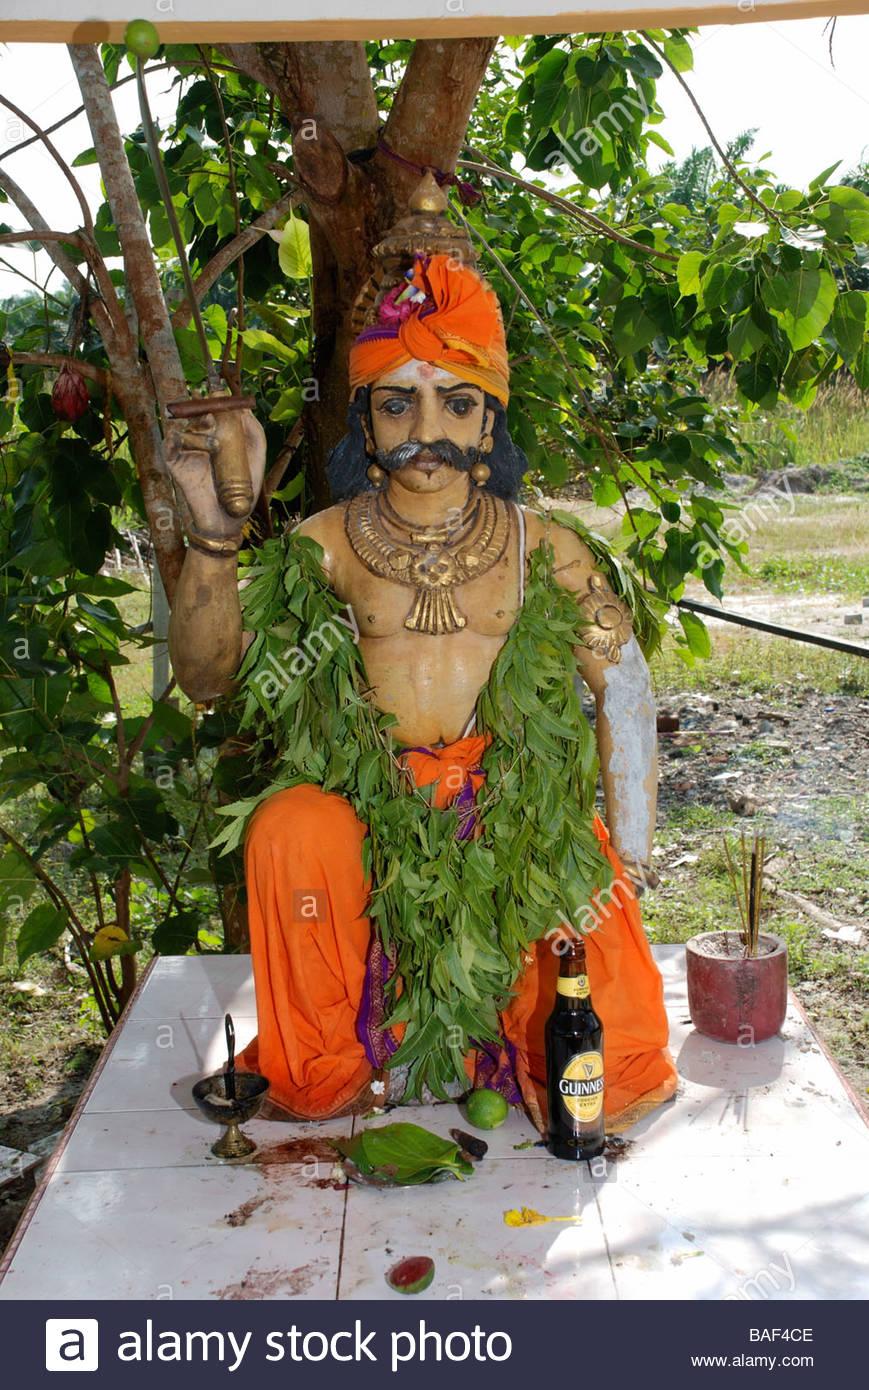 Statua di seduto maschio divinità Hindu Sri Maha Kaliaman tempio indù Lumut Perak Malaysia Immagini Stock